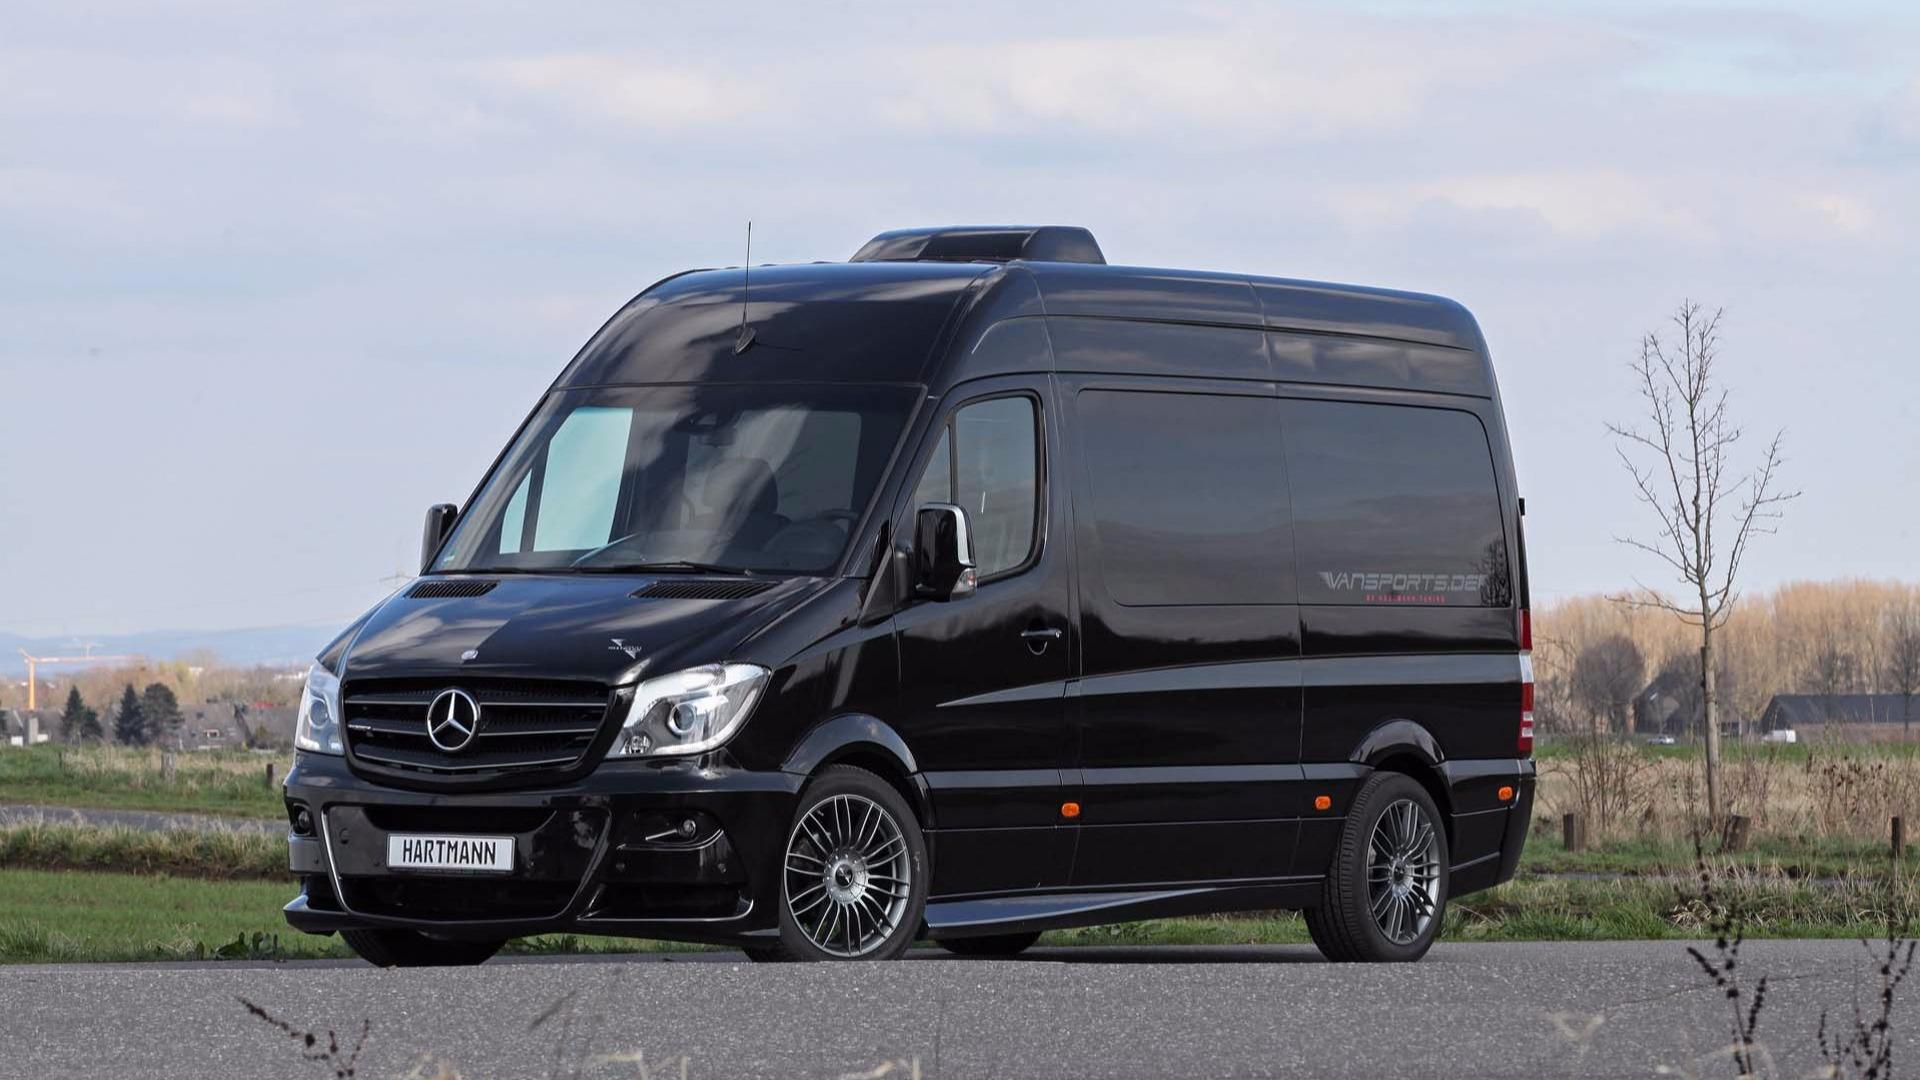 mercedes spinter hartman camping car pour frimeurs. Black Bedroom Furniture Sets. Home Design Ideas